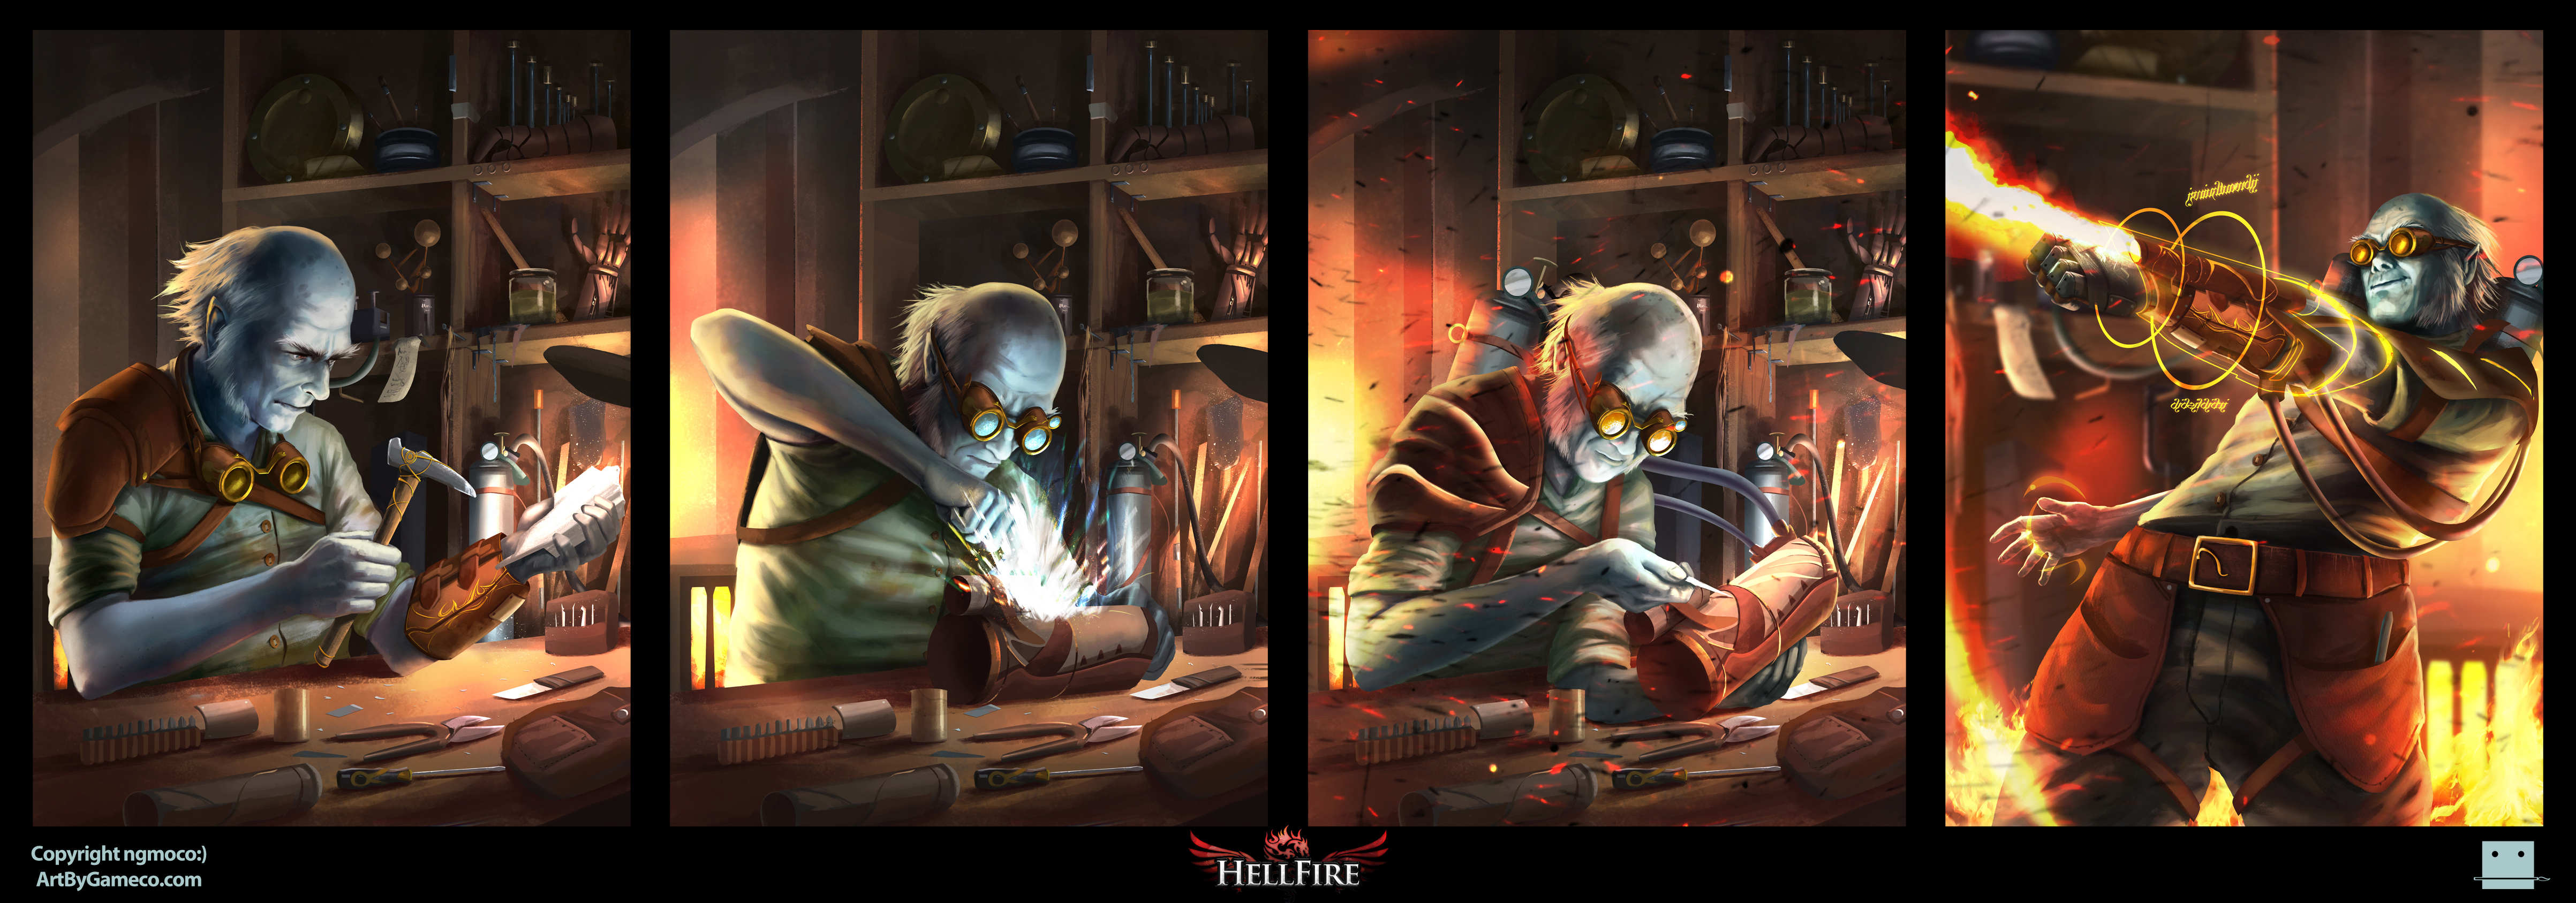 Hellfire - Kilmin Grestly by Sickbrush